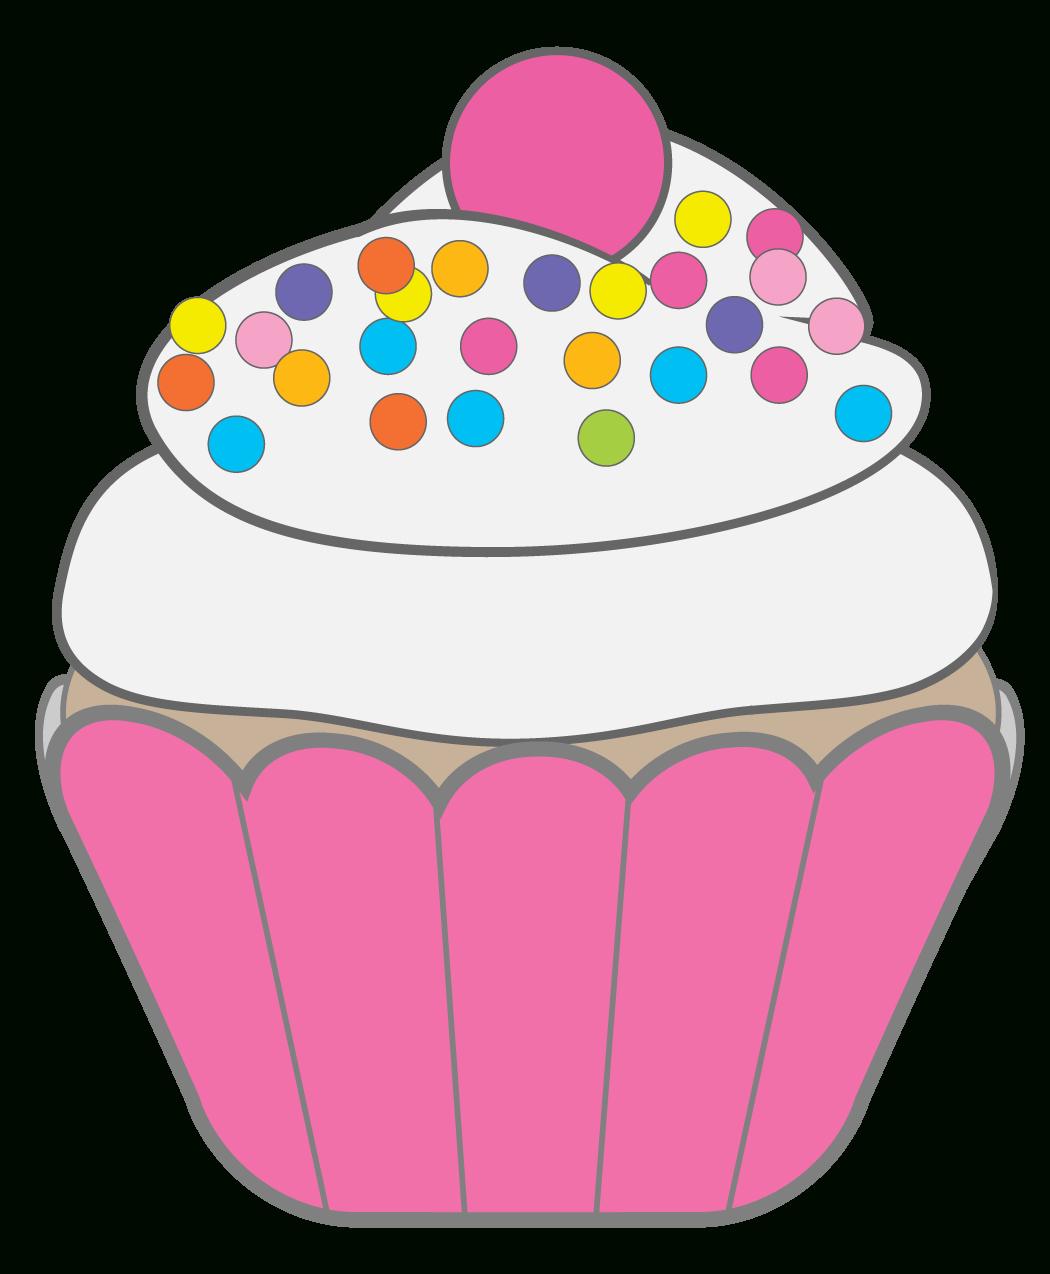 Cupcakes / Muffins   Cupcakes   Birthday Cake Clip Art, Cupcake - Free Printable Cupcake Clipart